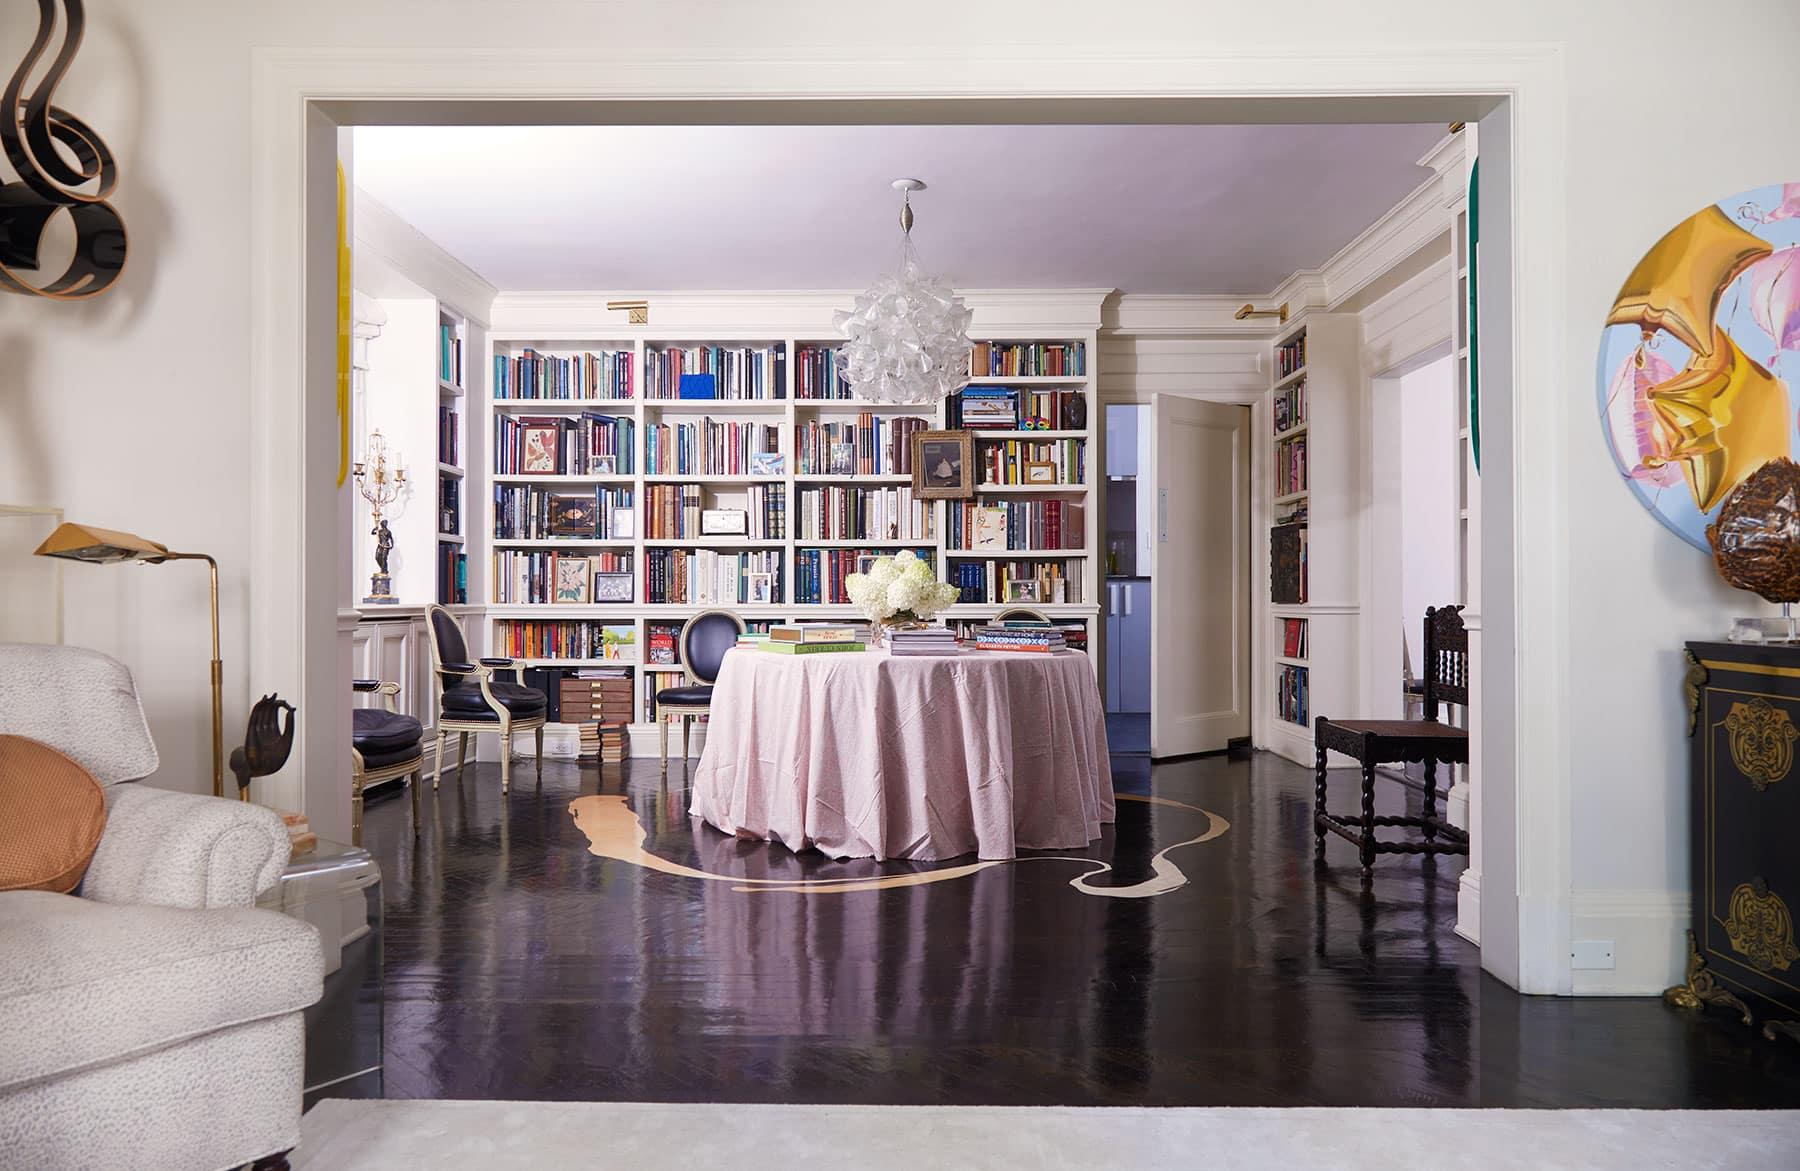 Blair Voltz Clarke and Alistair Clarke New York apartment library